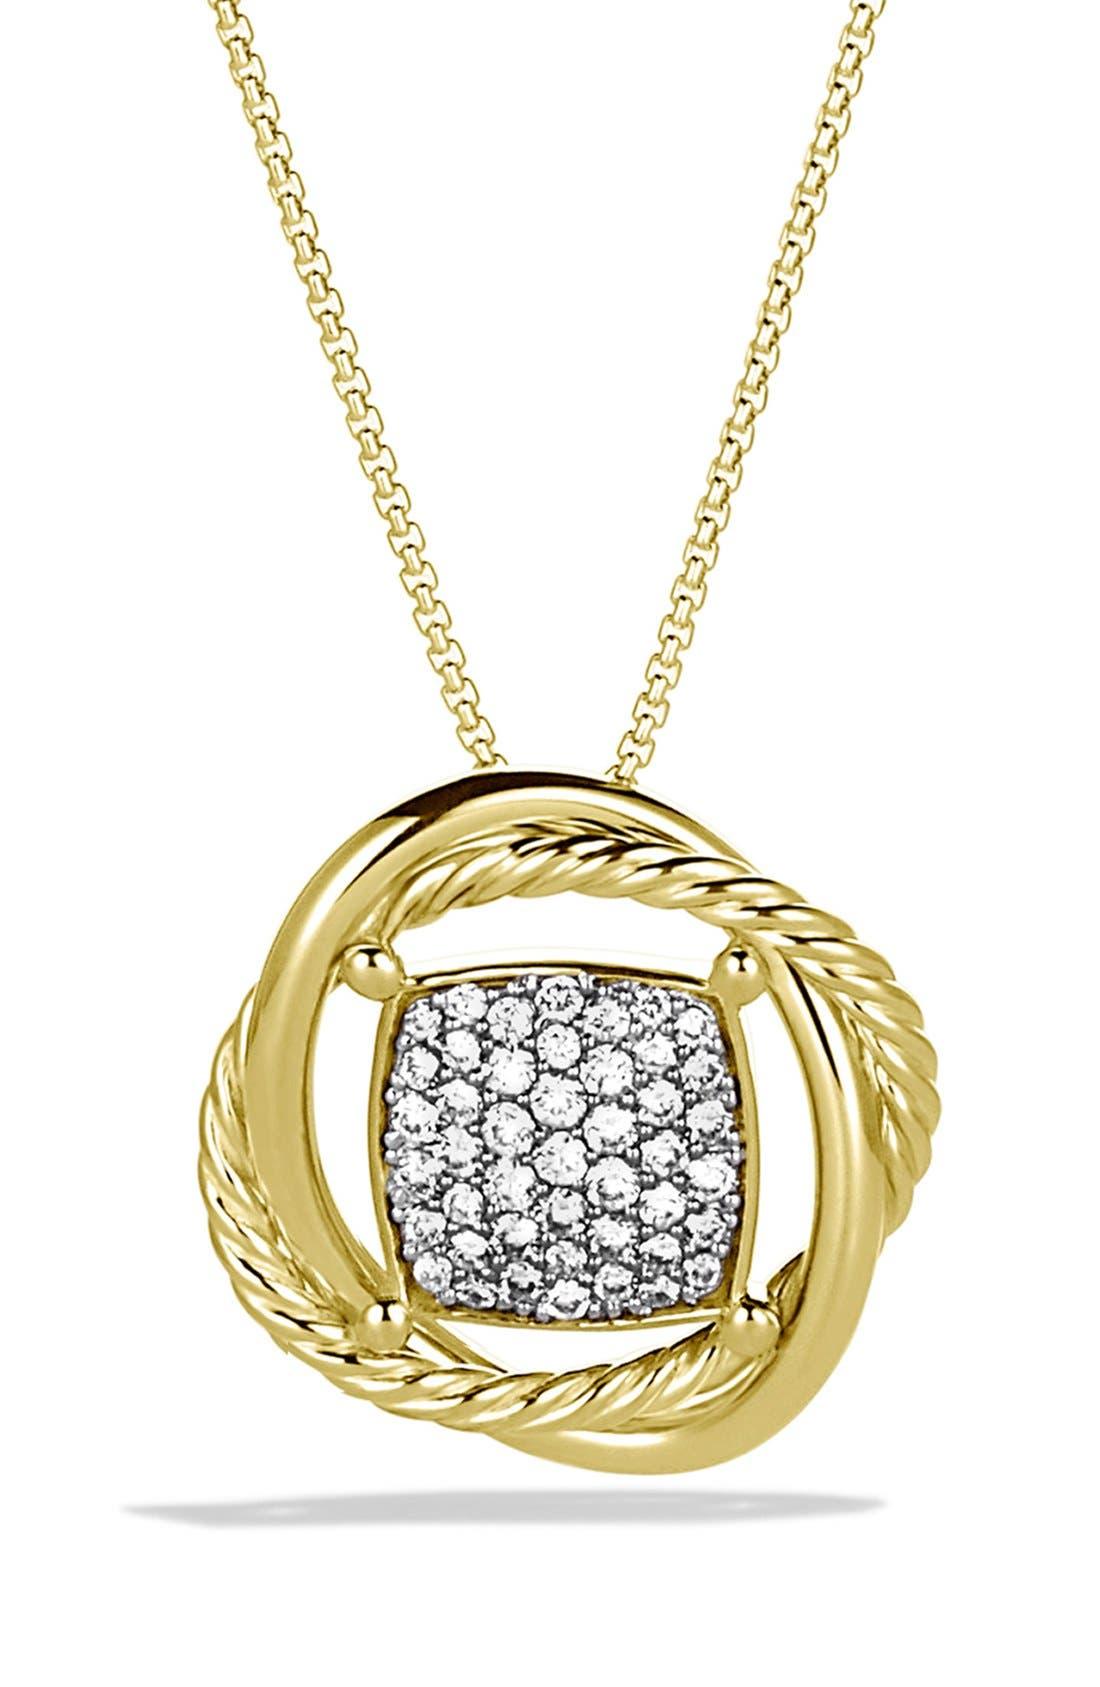 Main Image - David Yurman 'Infinity' Infinity Pendant with Diamonds in Gold on Chain